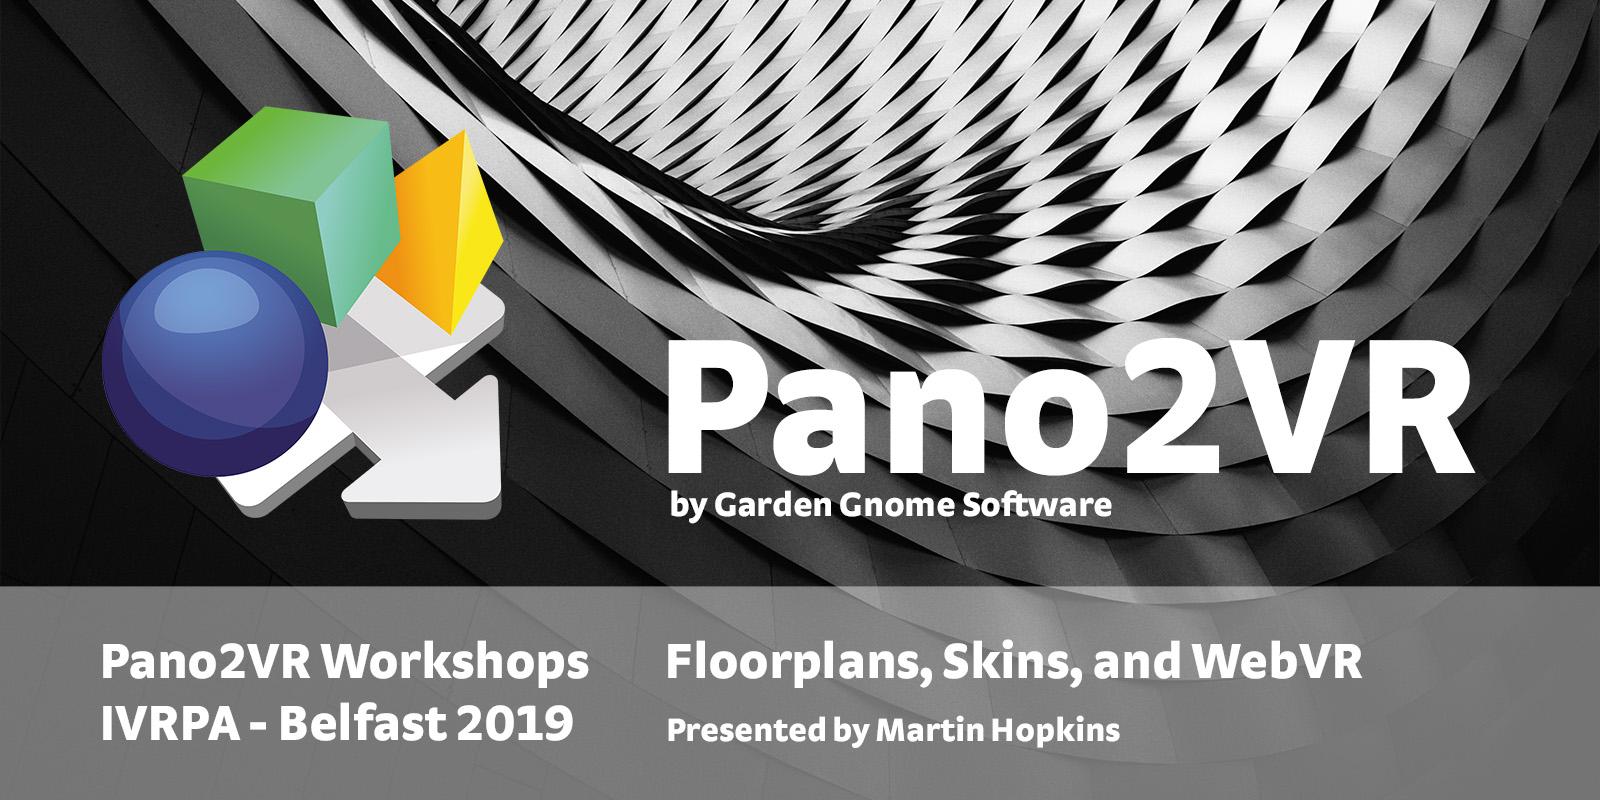 Pano2VR Workshops IVRPA Belfast 2019